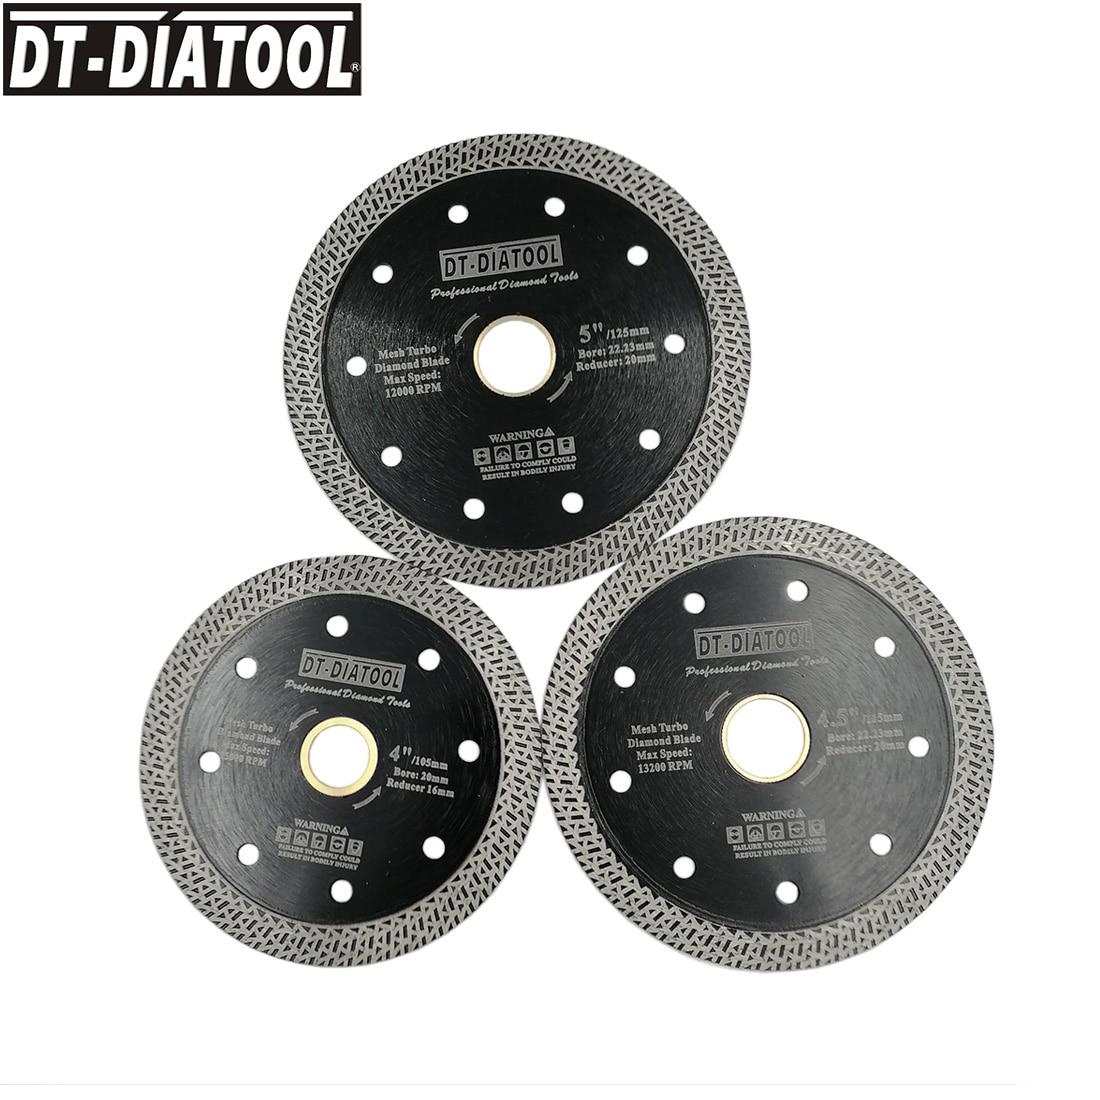 DT-DIATOOL 2 adet 4